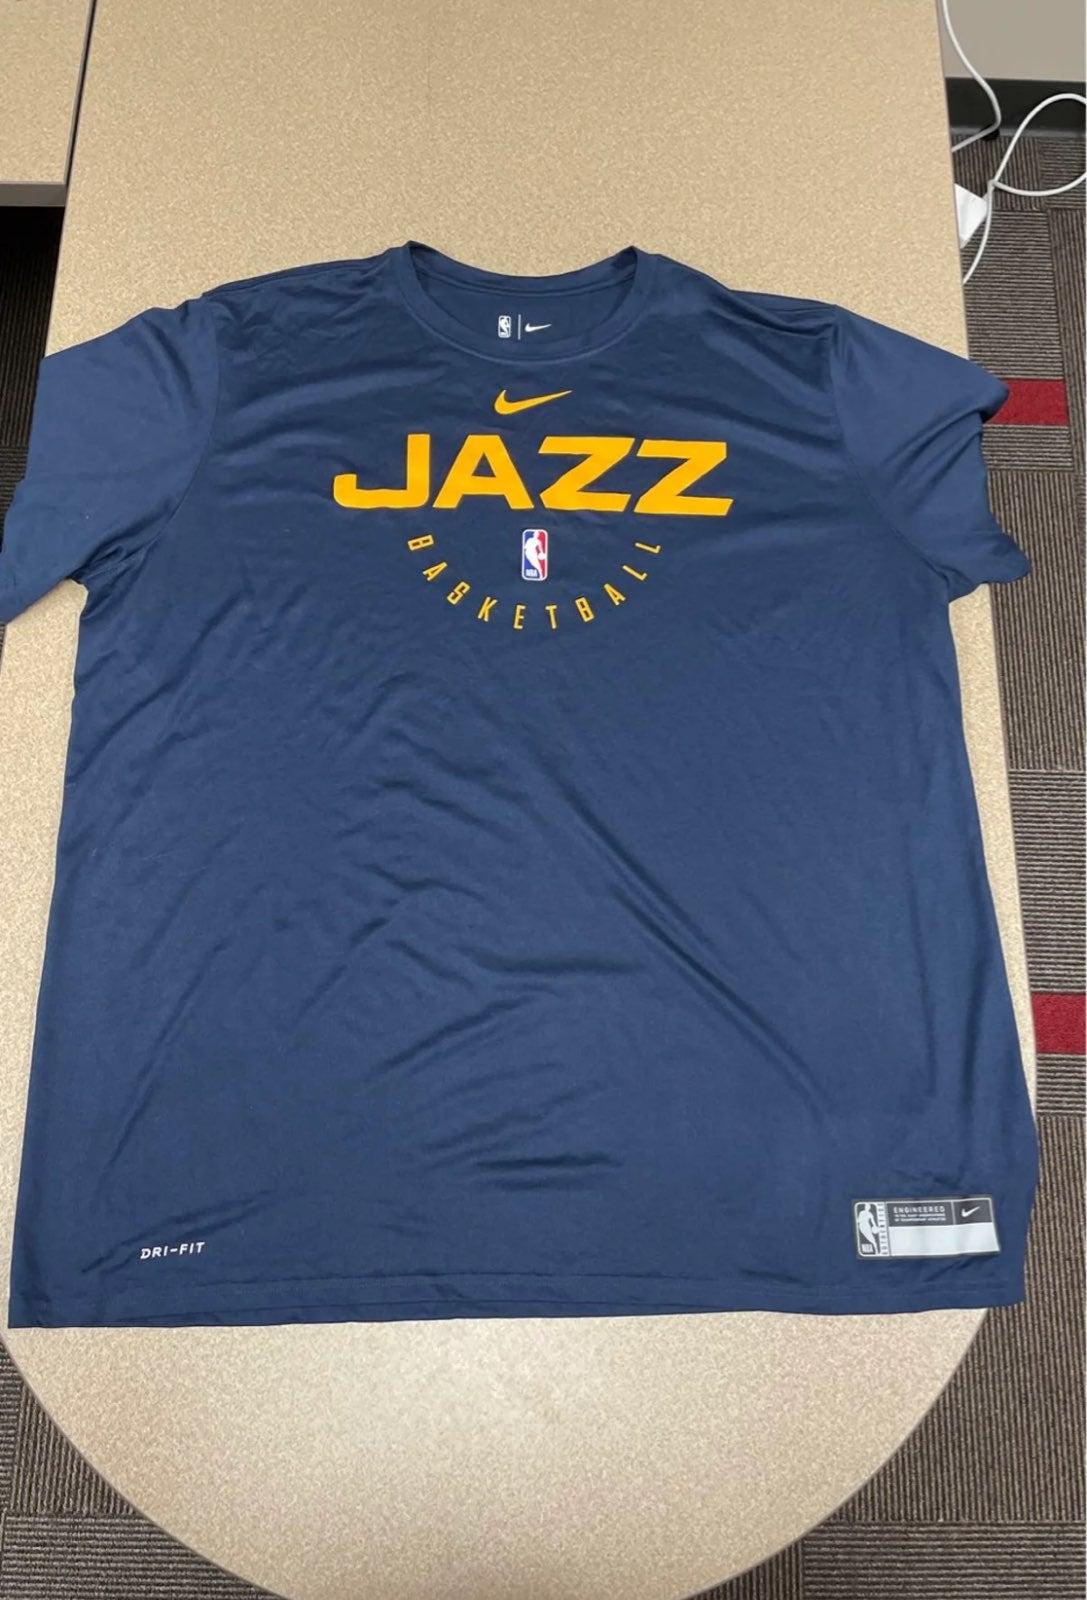 Jazz T-Shirt Bundle